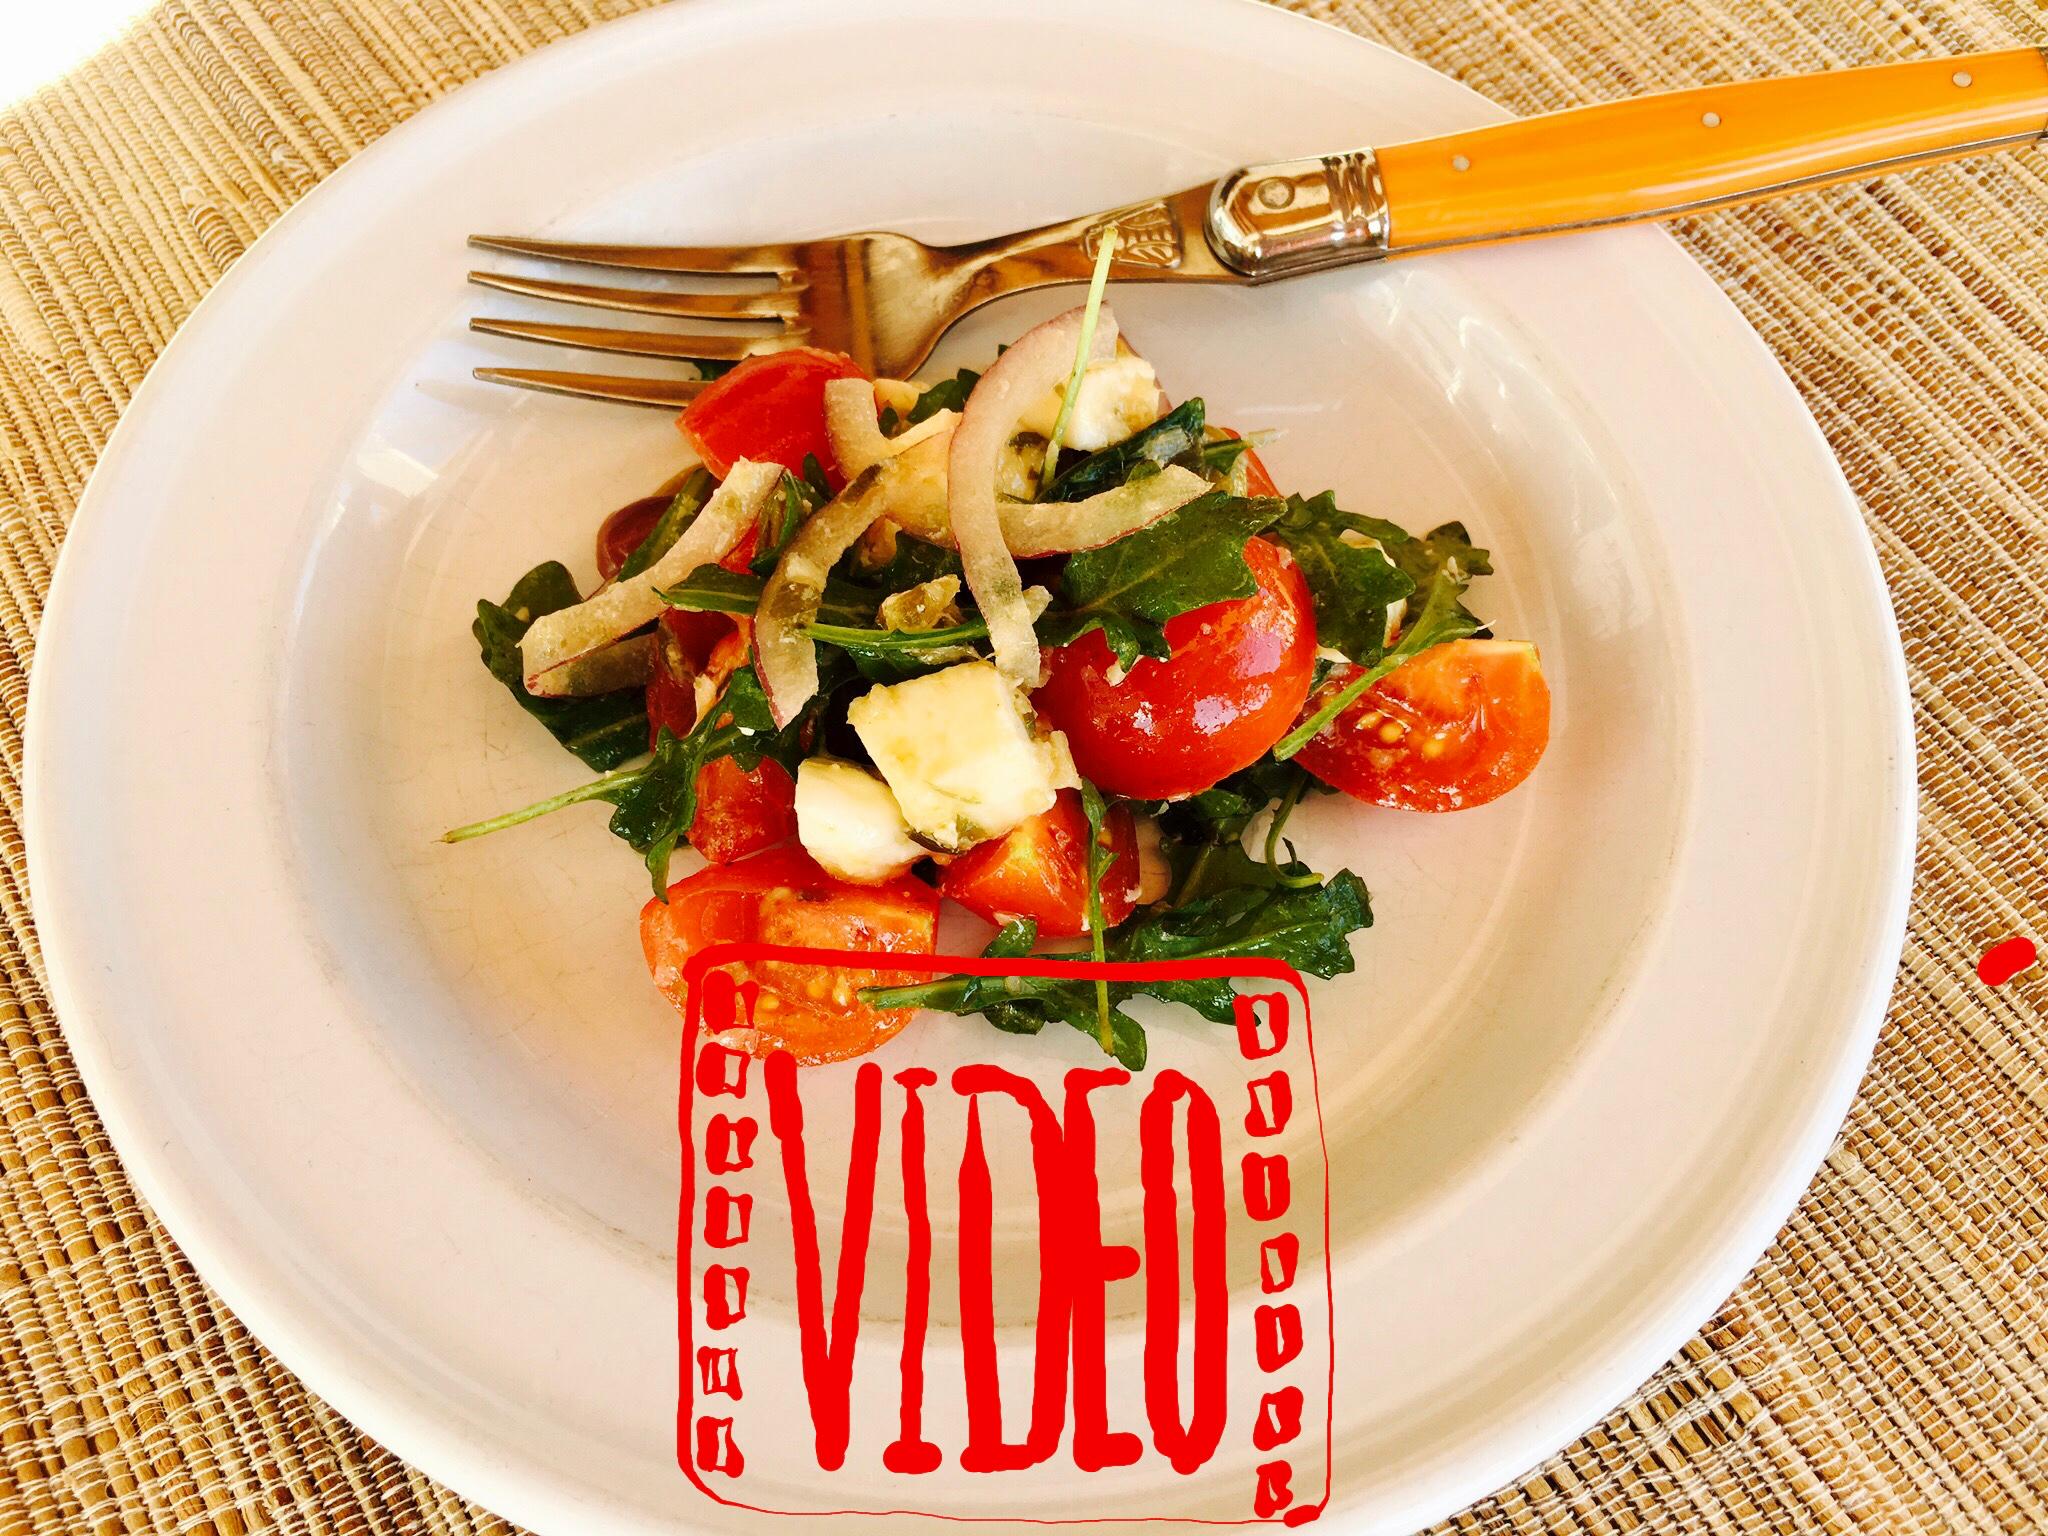 Tomato-Mozzarella Salad with Sauce 7